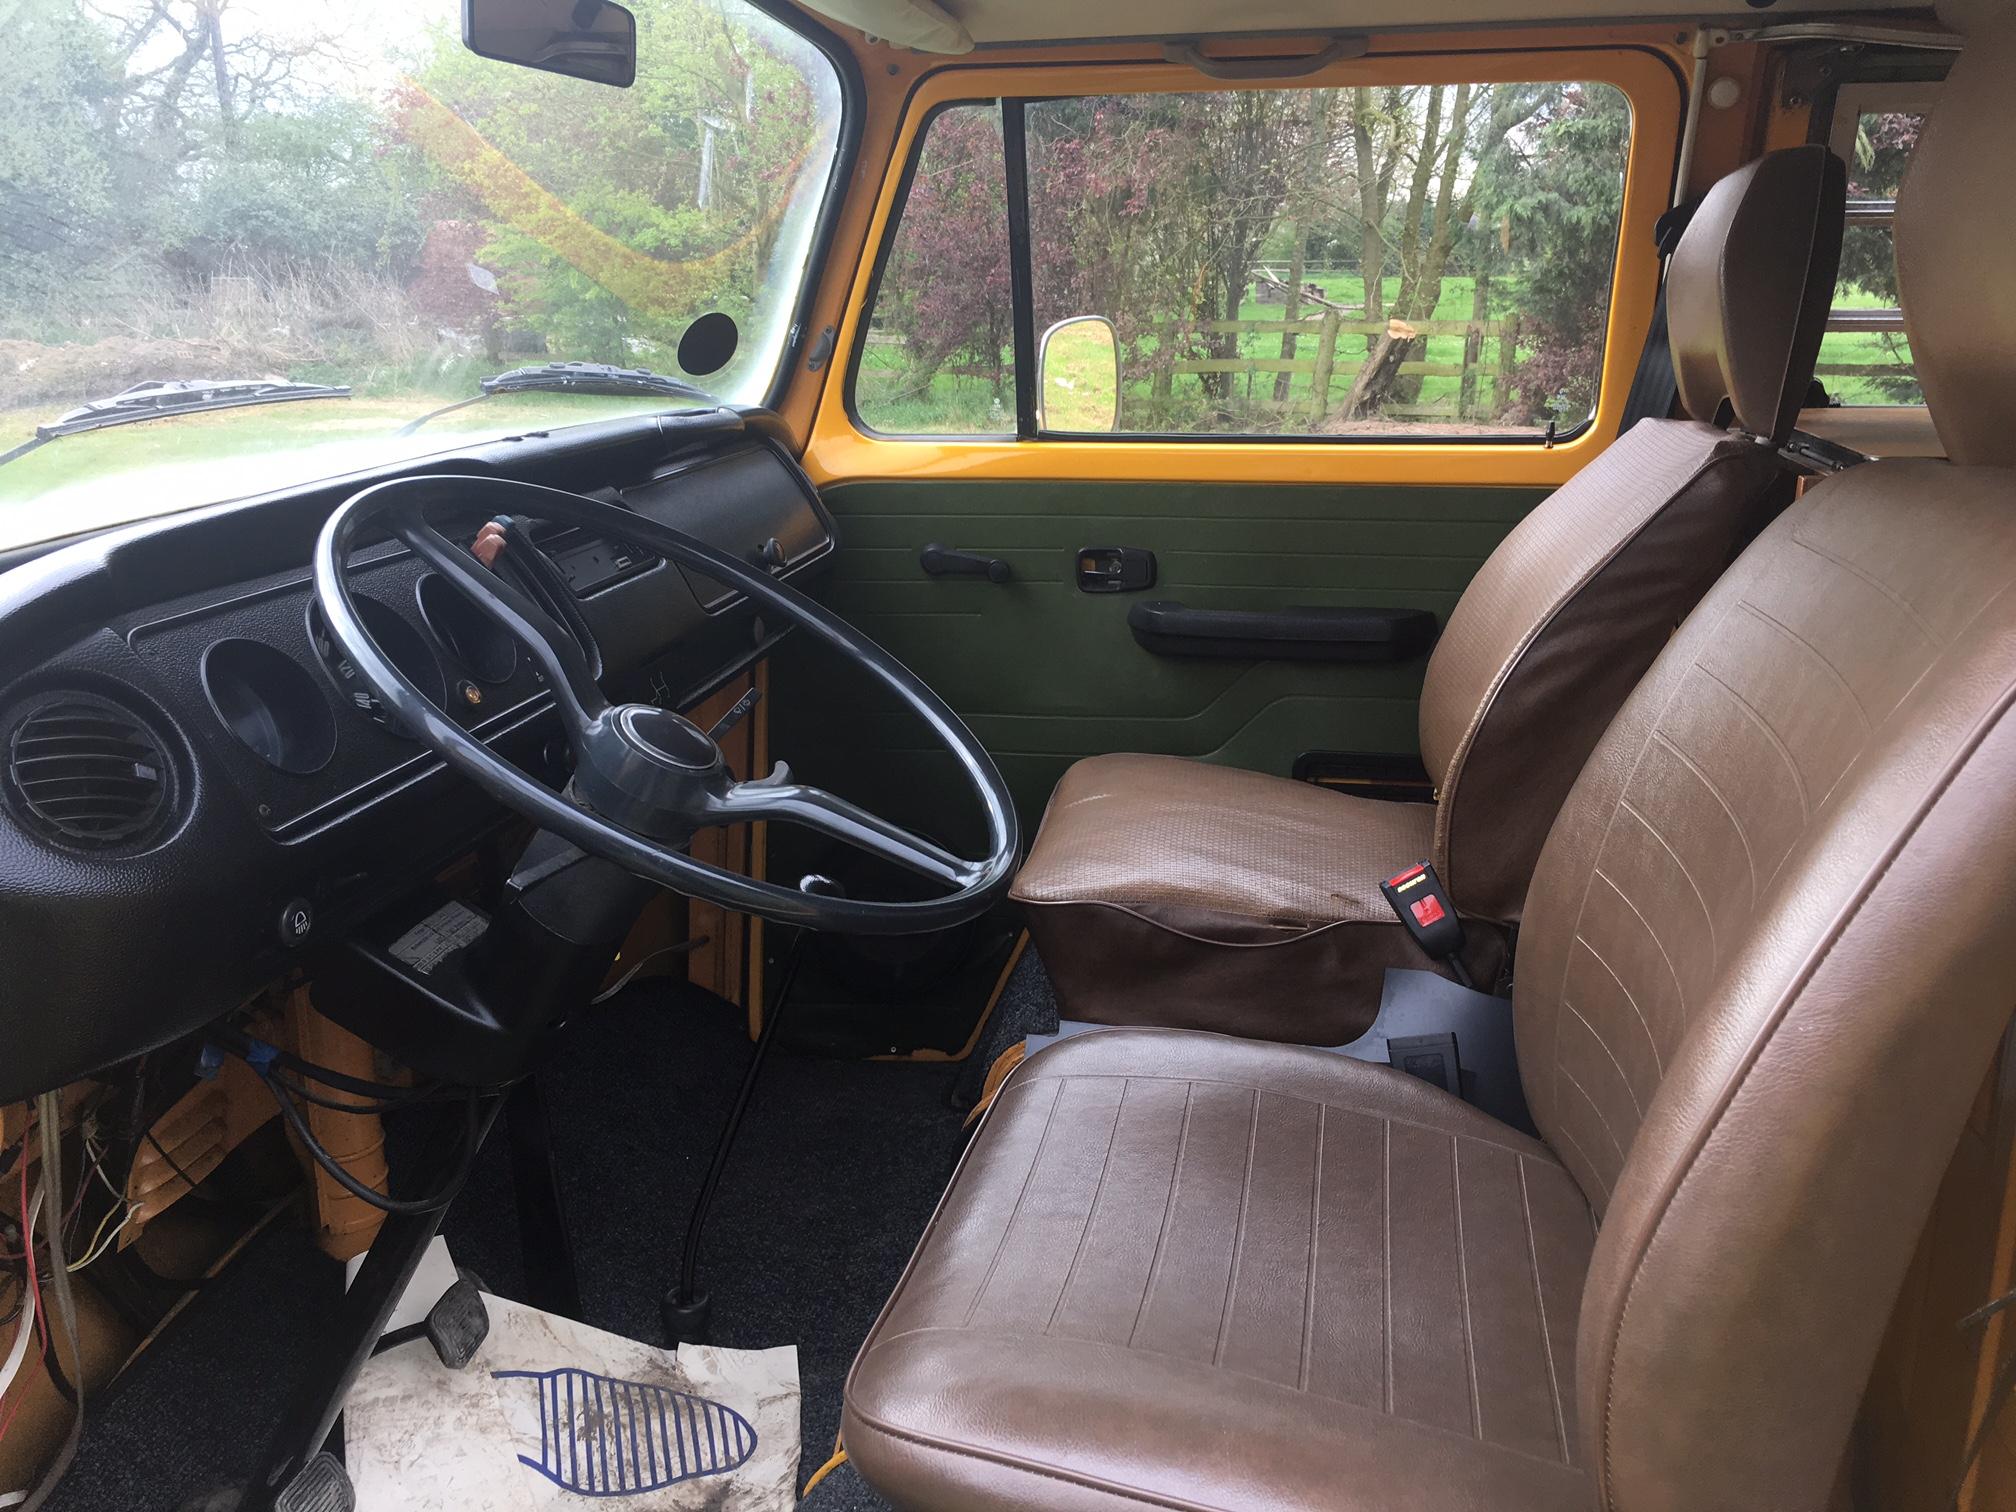 1978 westfalia 4 berth camper cab